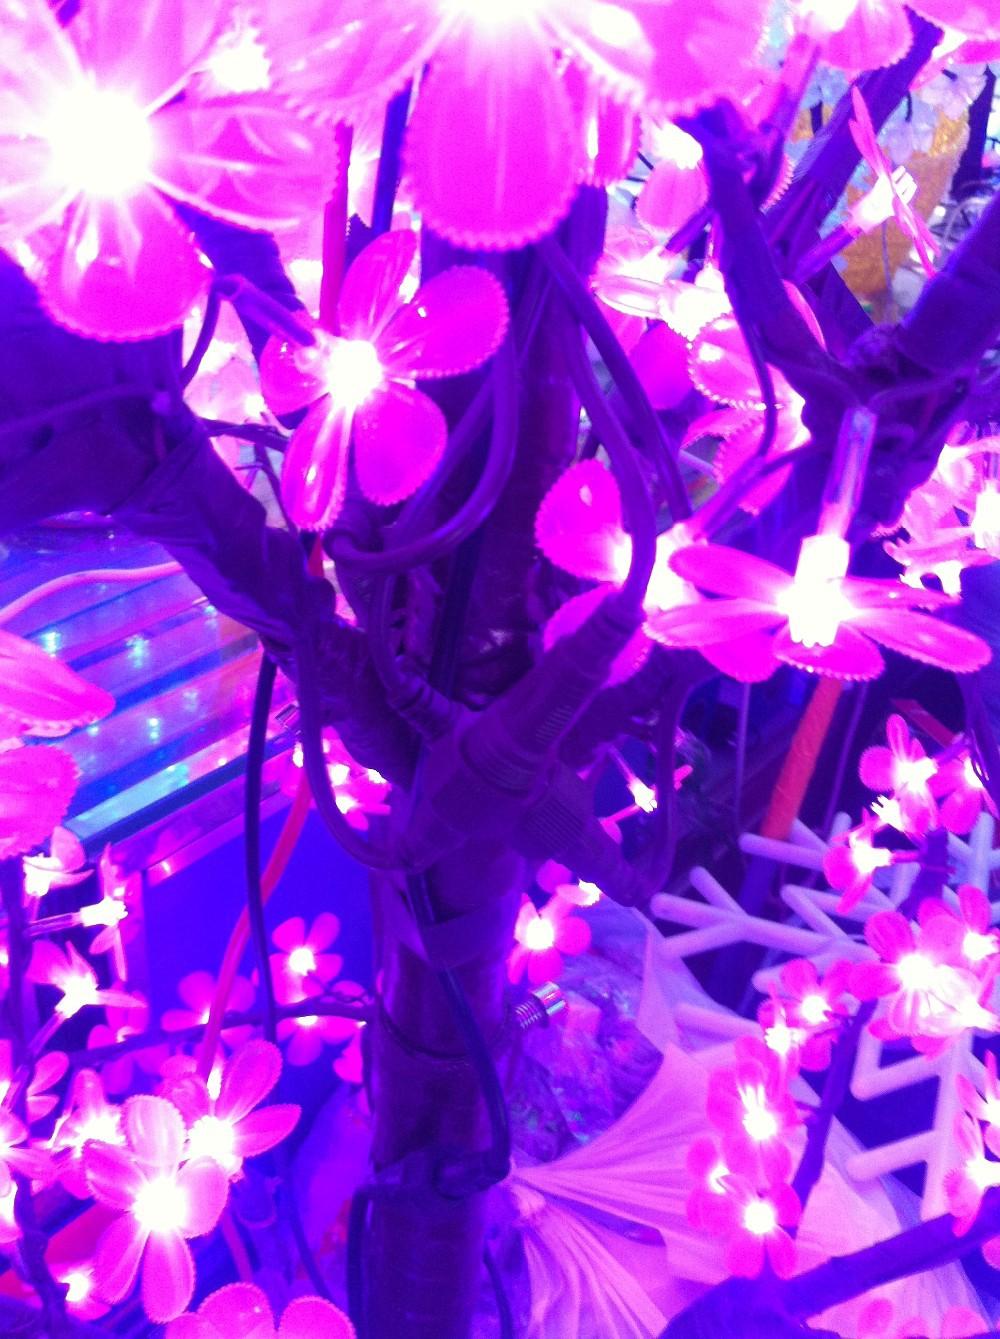 2014 New Holiday Light Christmas Decoration Lights Luxury Handmade Drtificial led Cherry Blossom Tree Light 250cm 1200 Light (3)